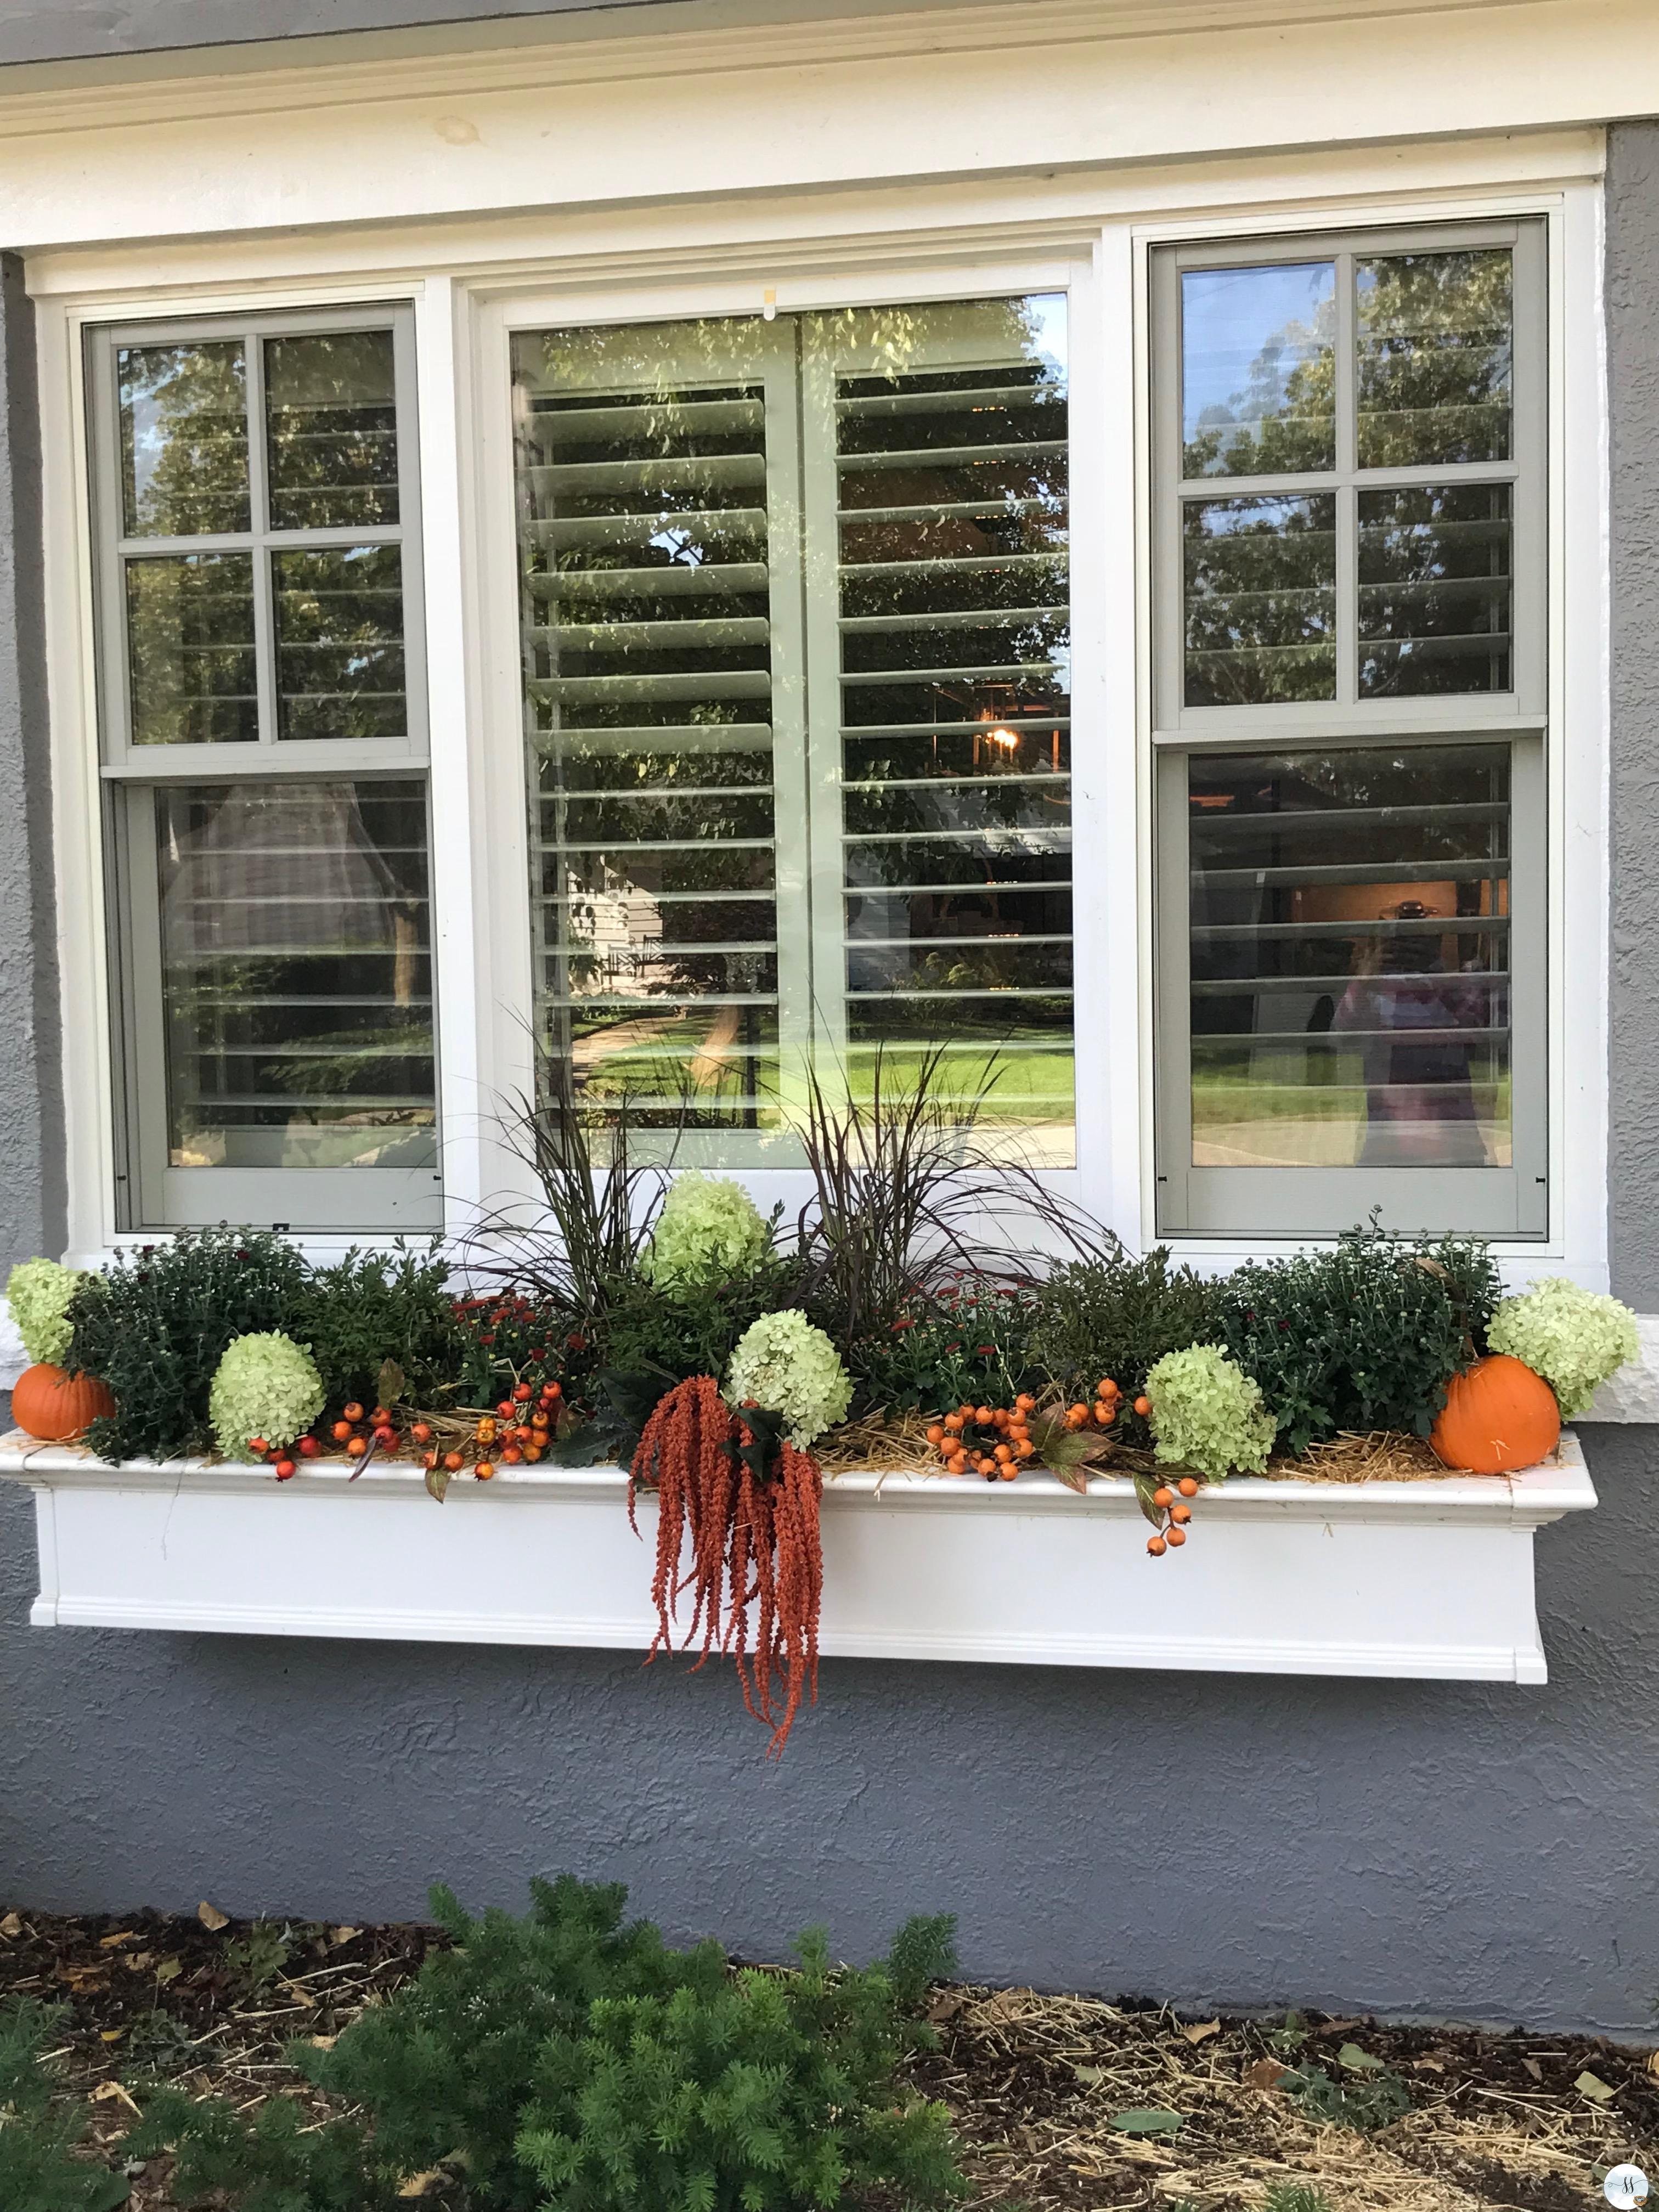 Fall decor, happy thanksgiving, mums, pumpkins, outdoor decor, better home and garden, garden decor